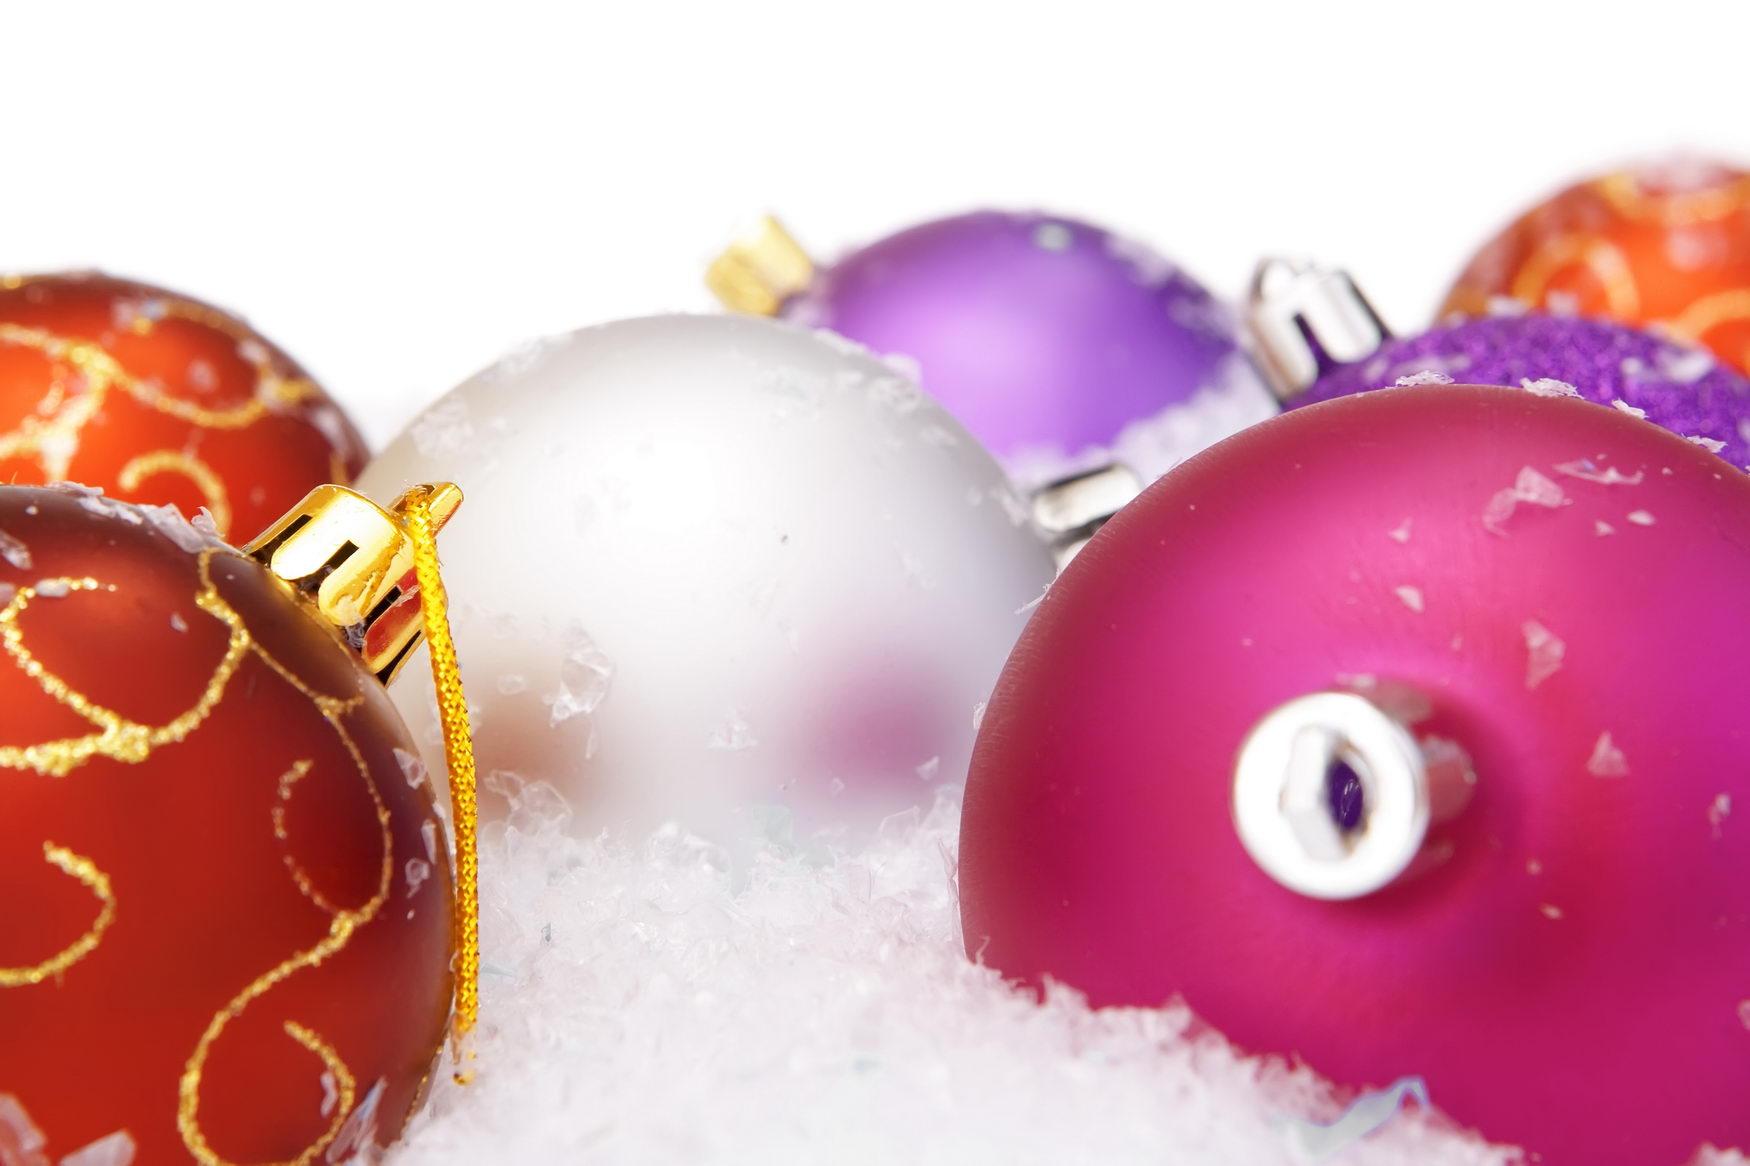 Christmas balls, Ball, Merry, Winter, White, HQ Photo